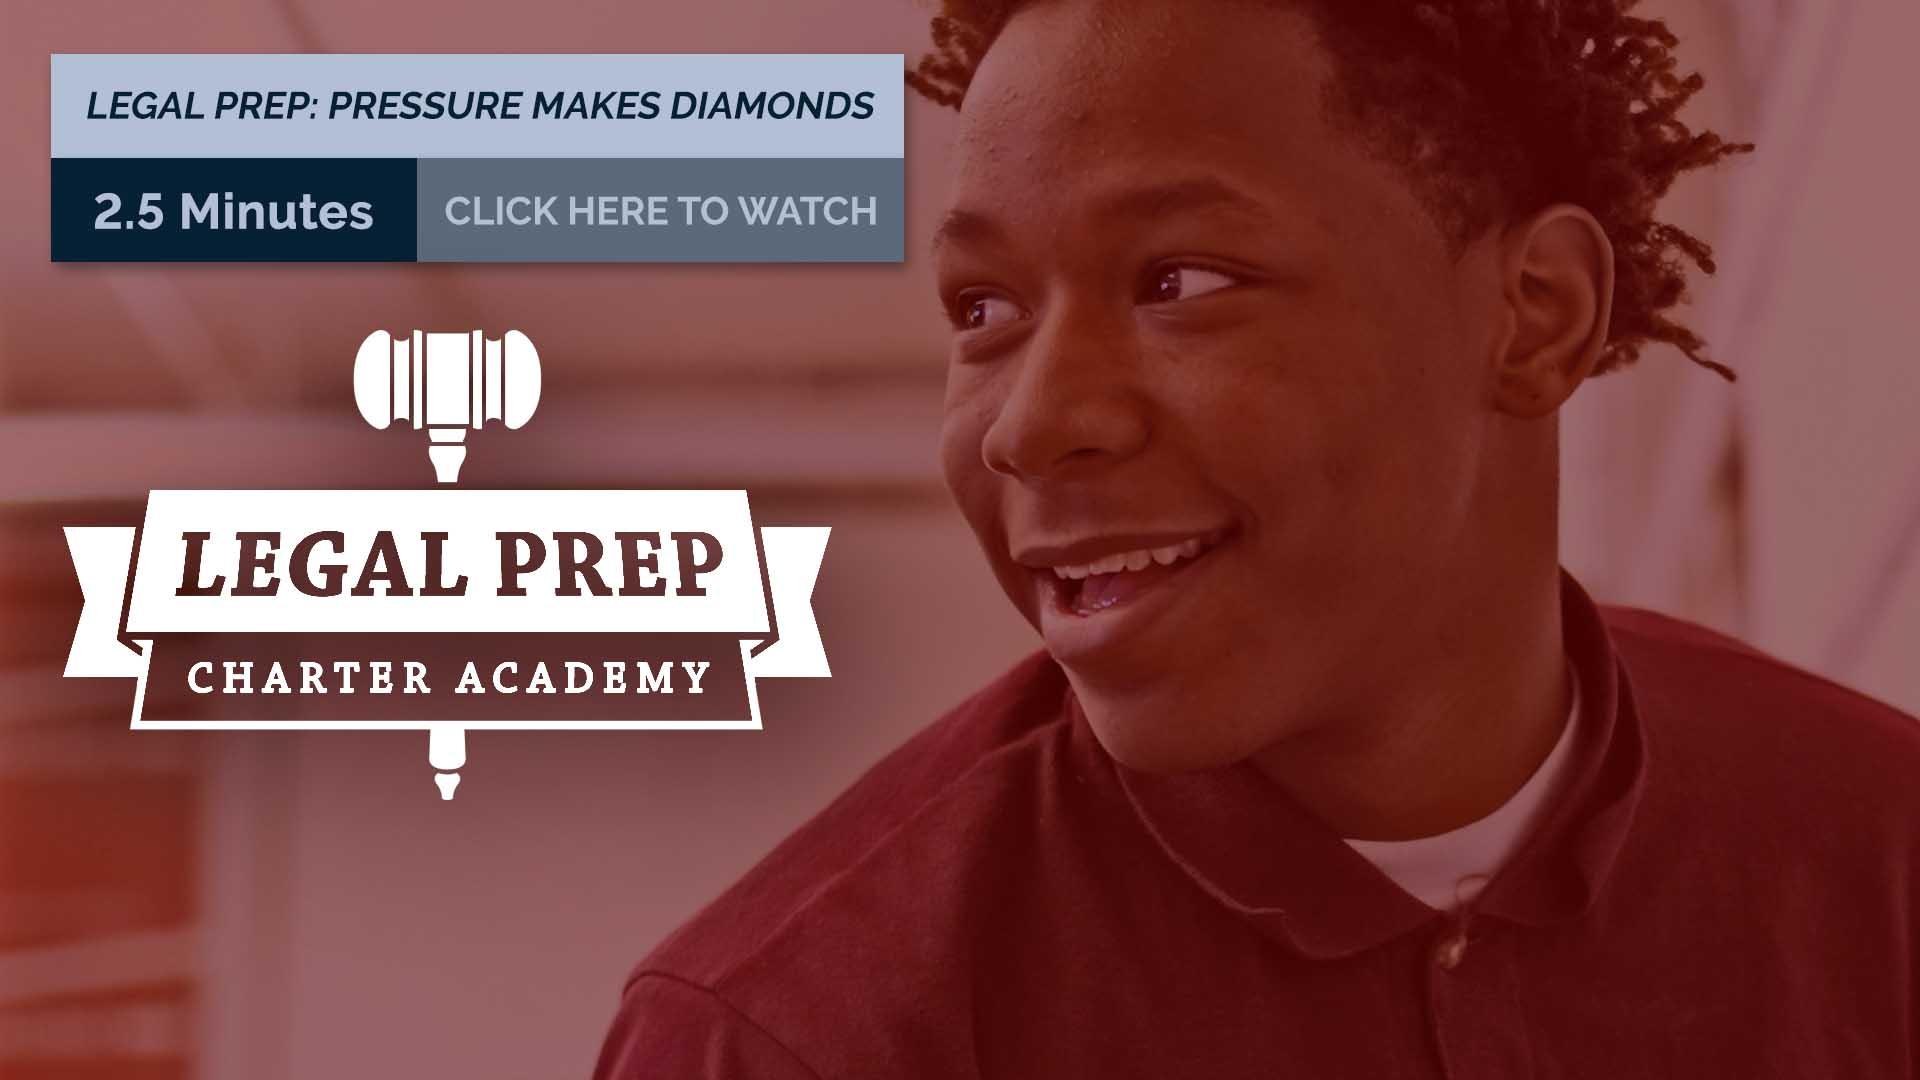 Pressue Makes Diamonds